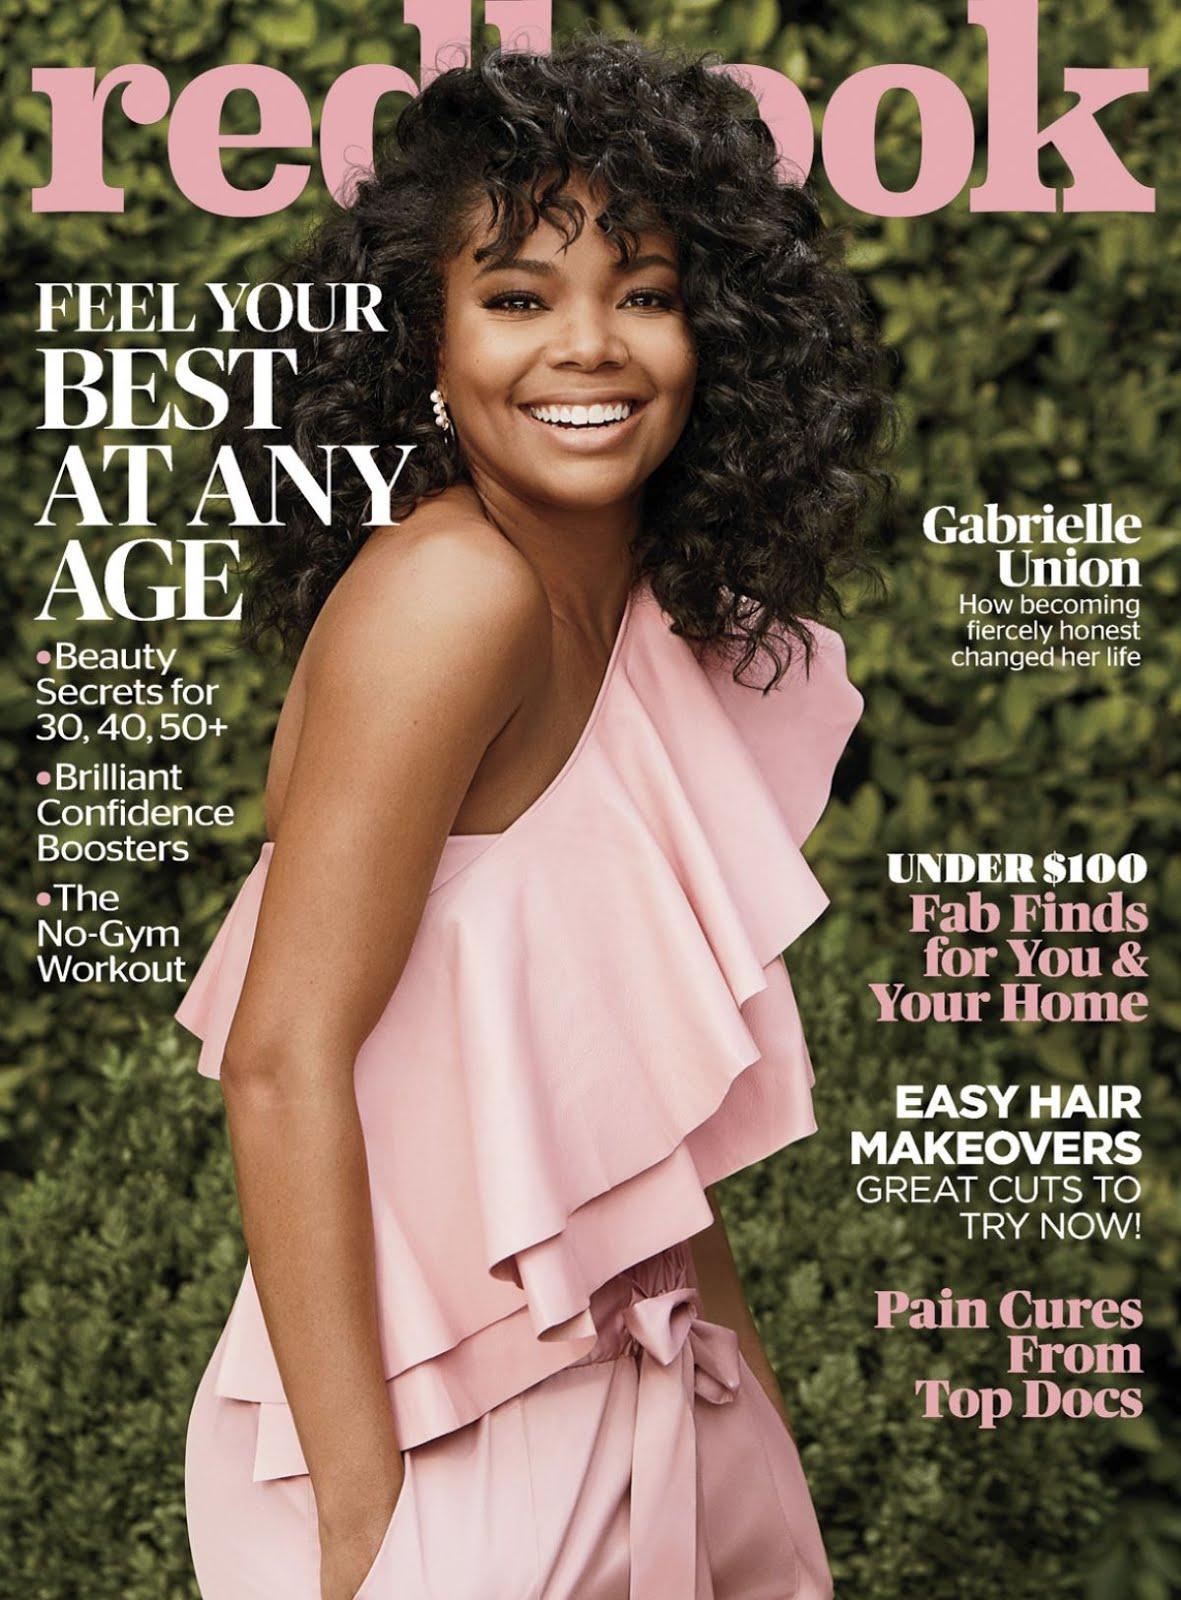 Gabrielle Union In Redbook Magazine March 2018 issue